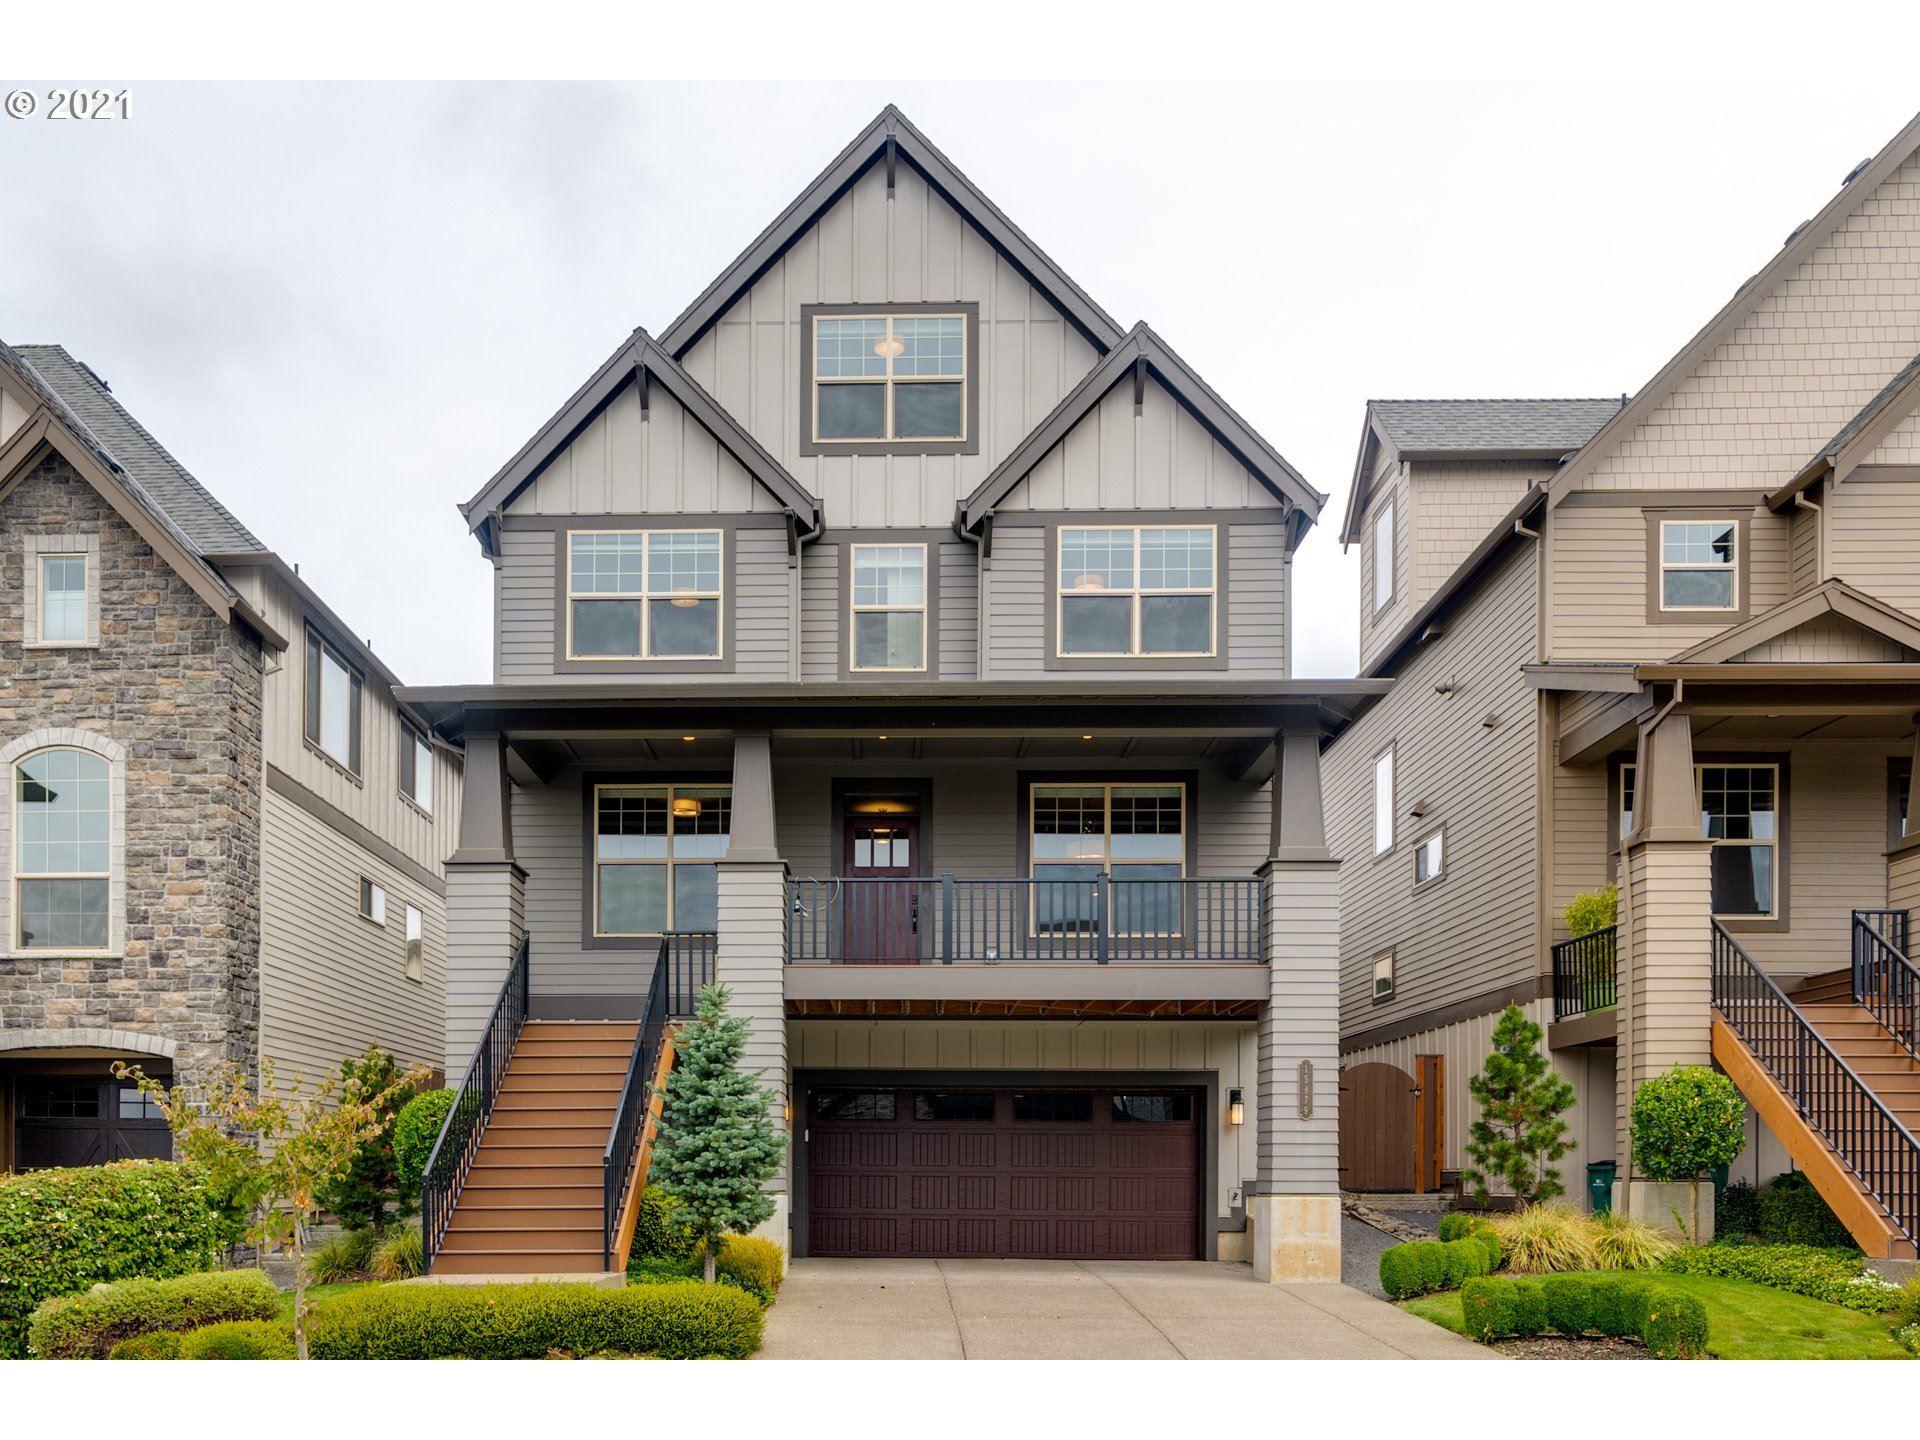 15879 NW LINDER ST, Portland, OR 97229 - MLS#: 21467184